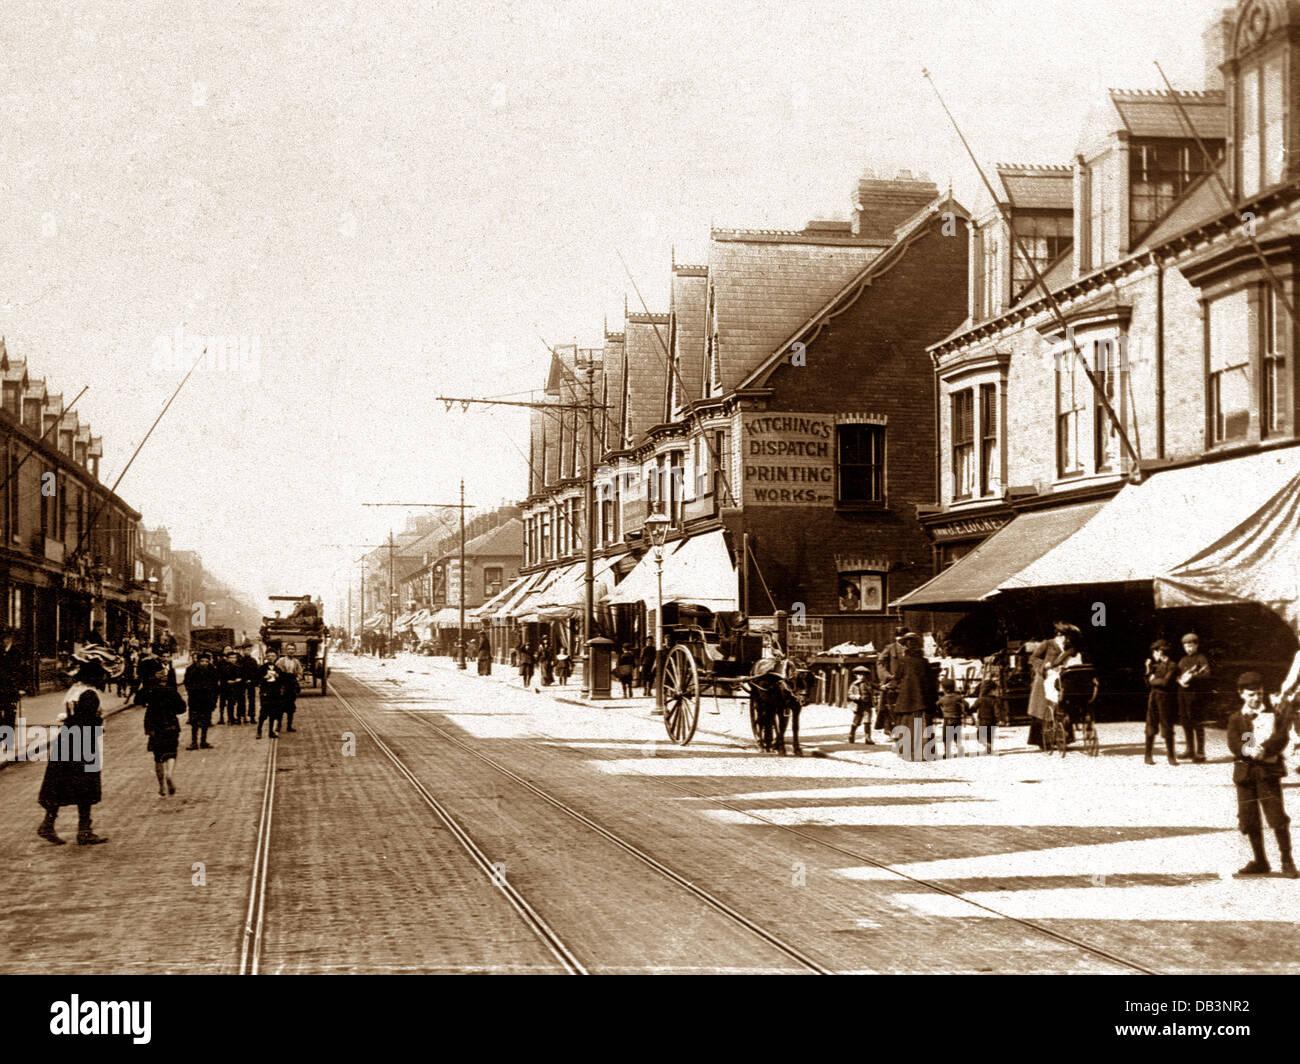 Hull Hessle Road early 1900s Stock Photo: 58475286 - Alamy